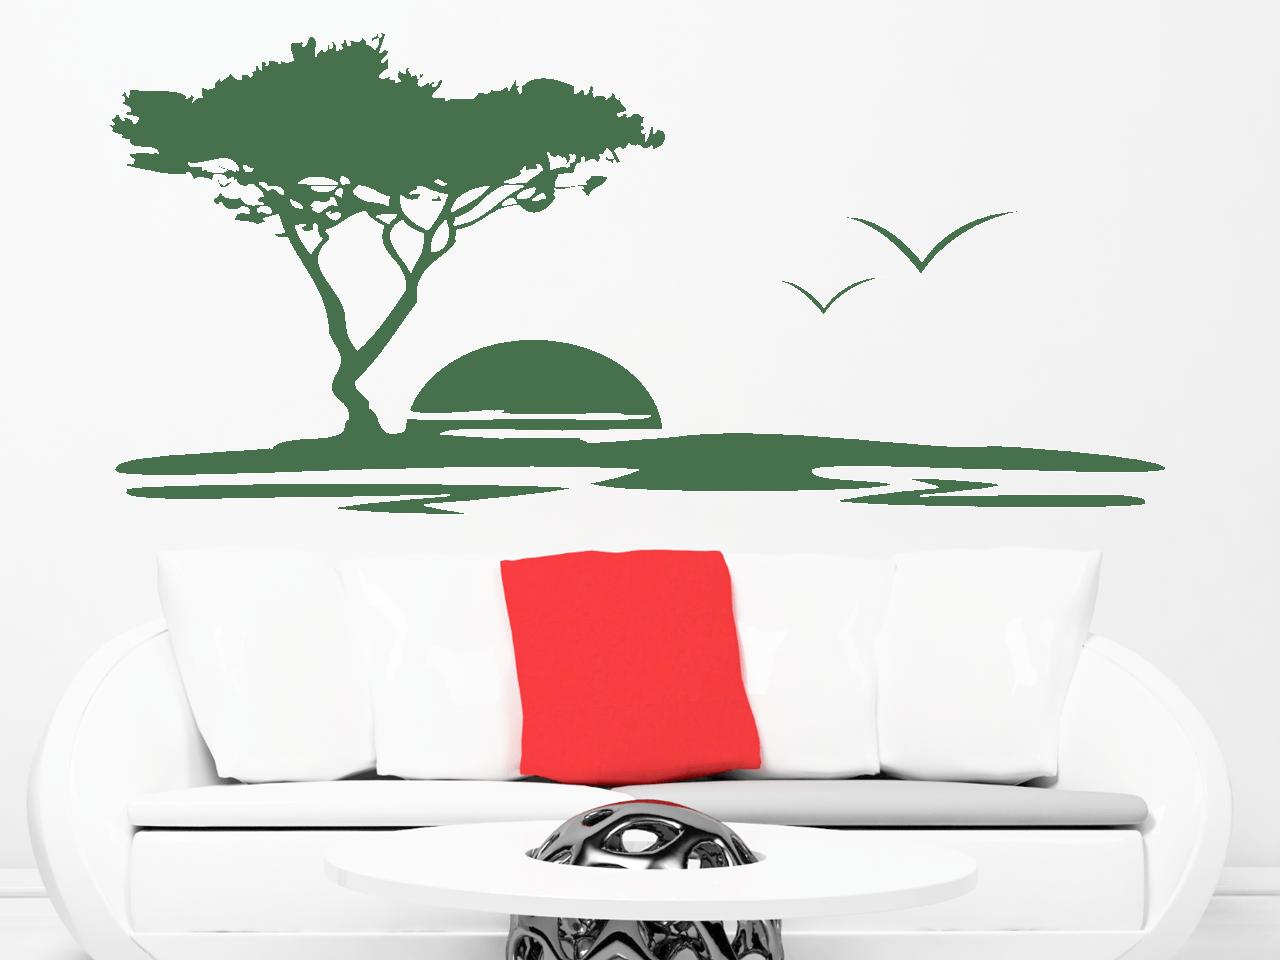 wandtattoo baum landschaft tocut werbetechnik wandtattoo. Black Bedroom Furniture Sets. Home Design Ideas